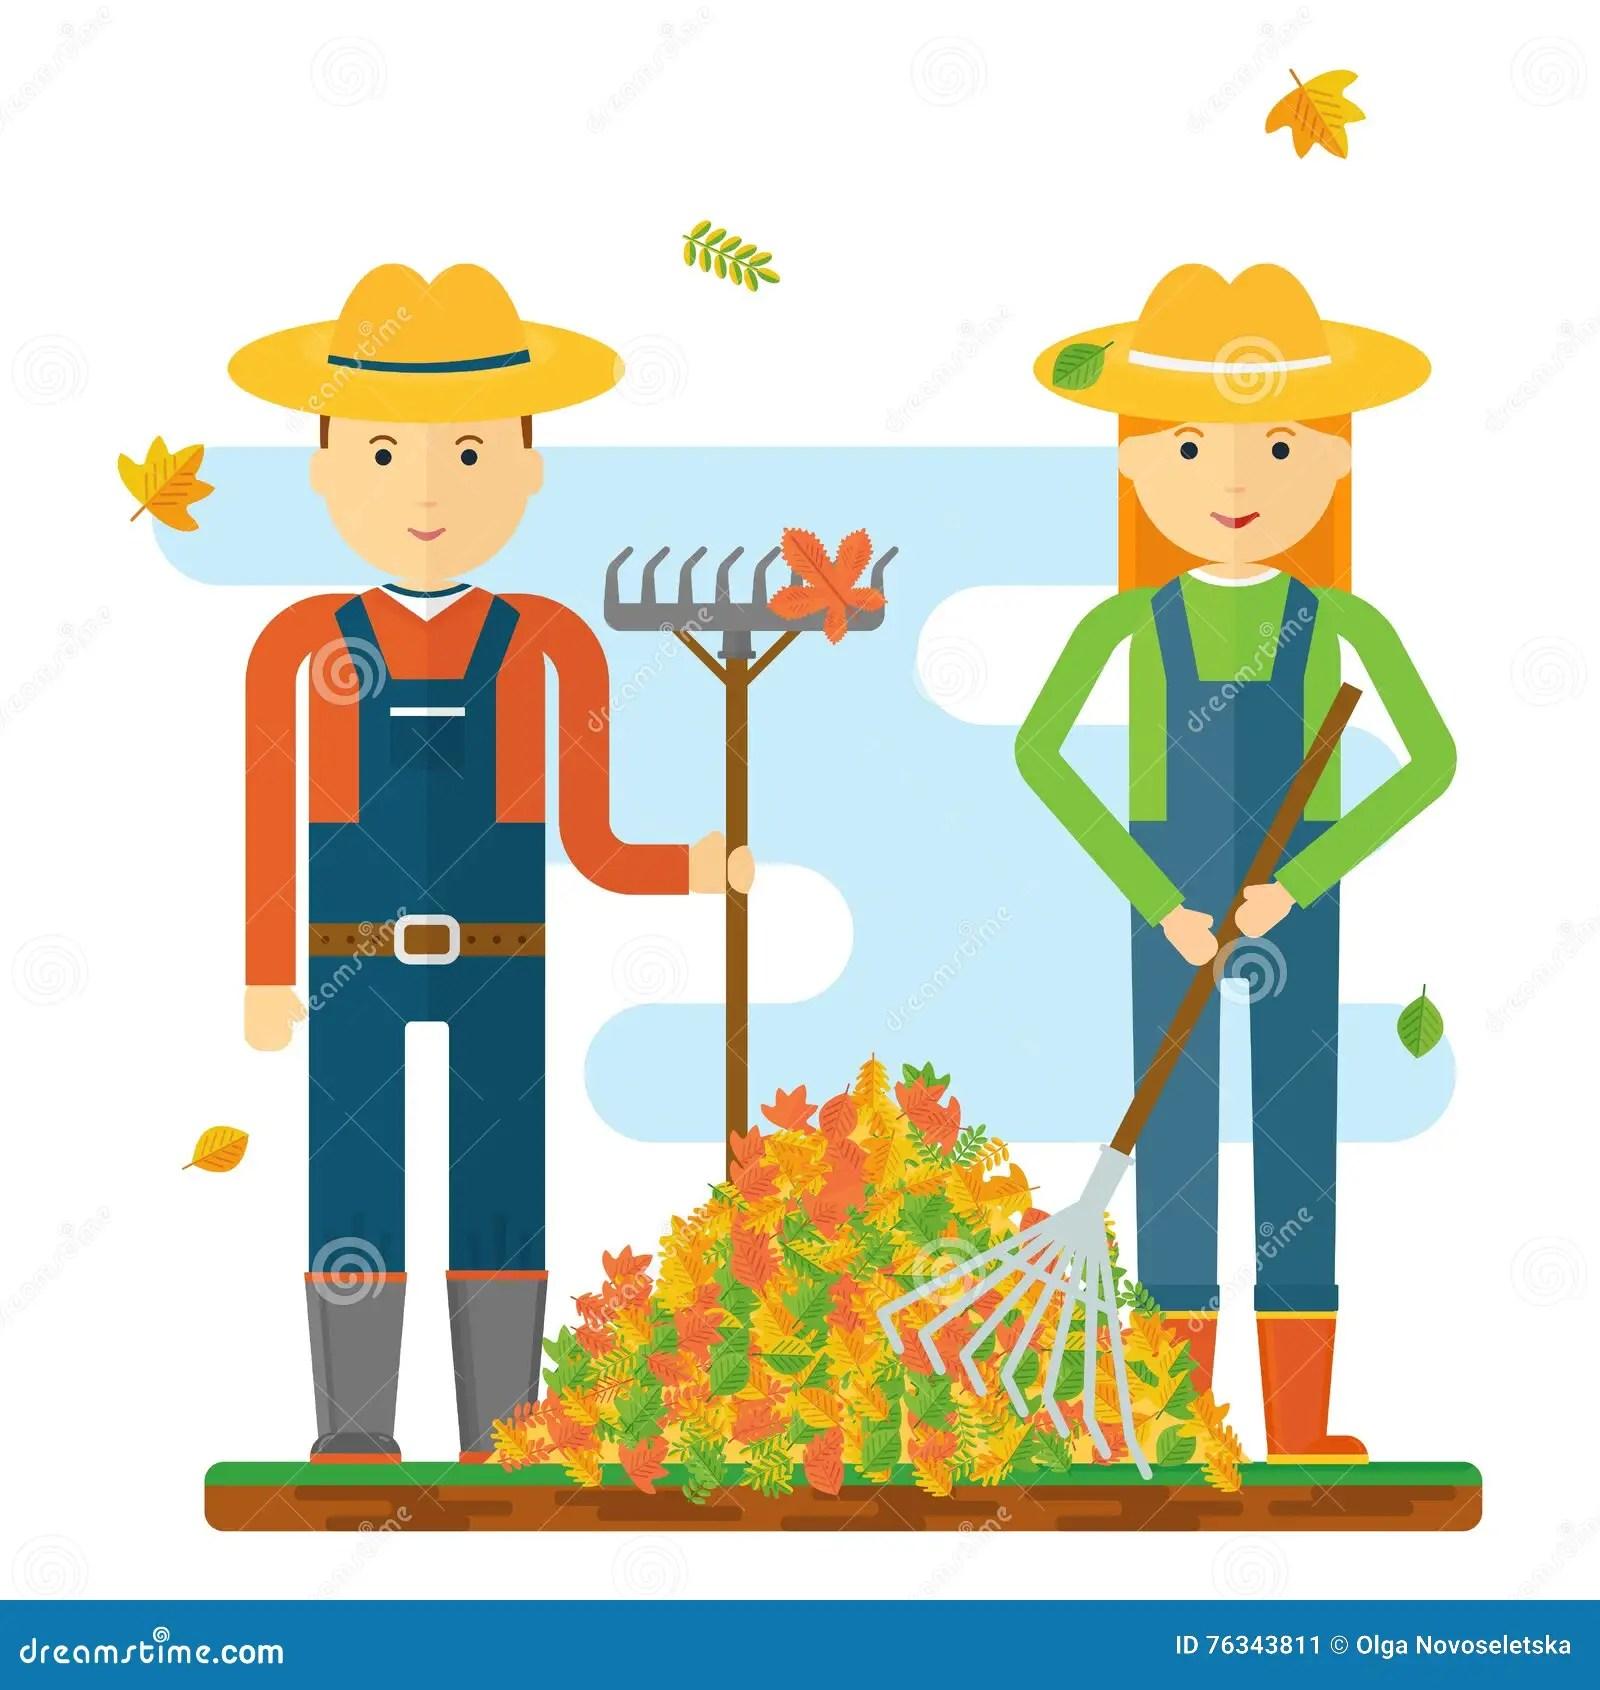 hight resolution of farmers raking leaves